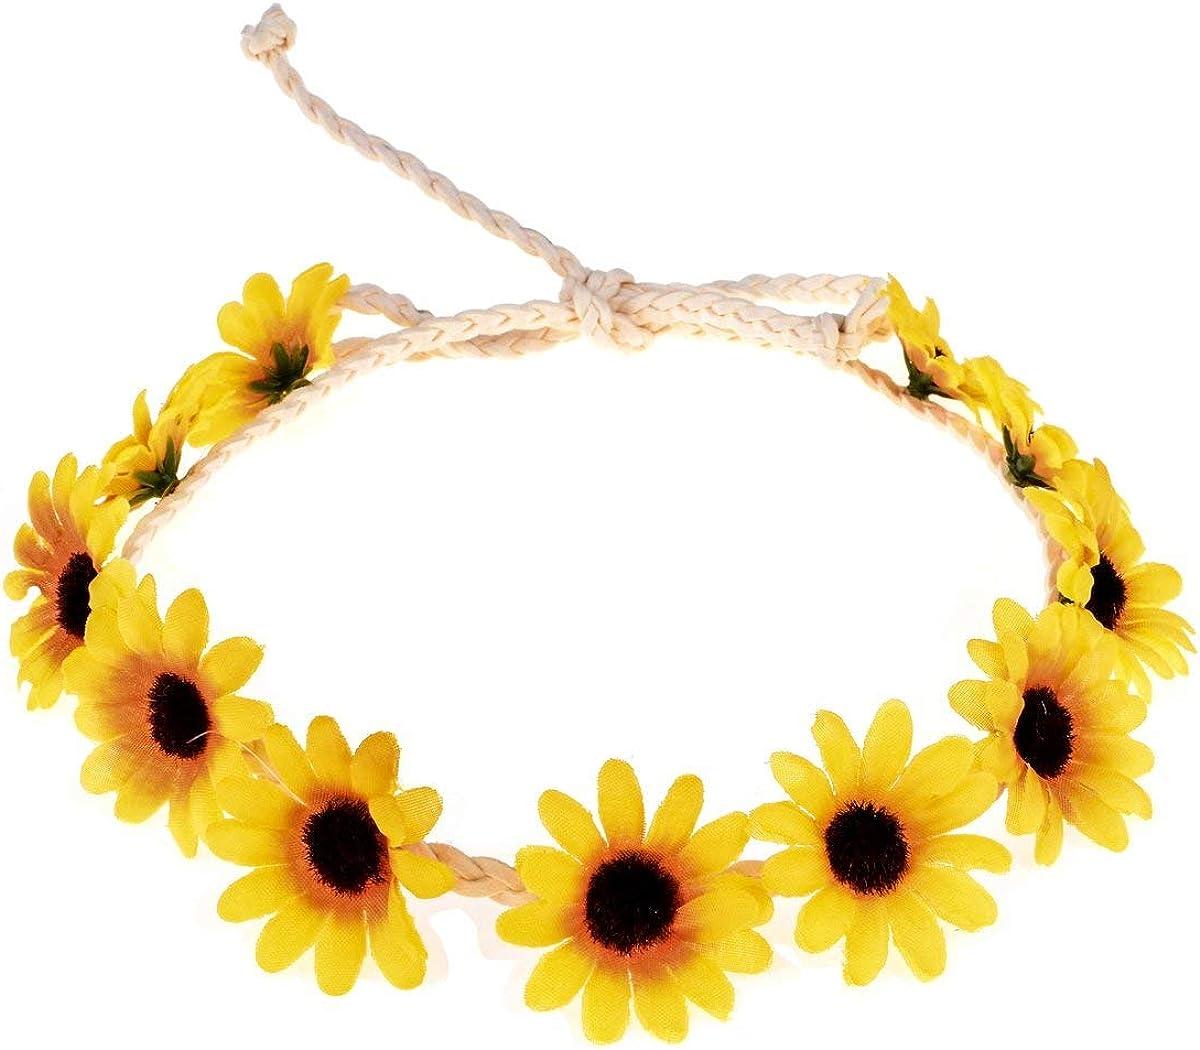 Sunflower Hoop Wreath